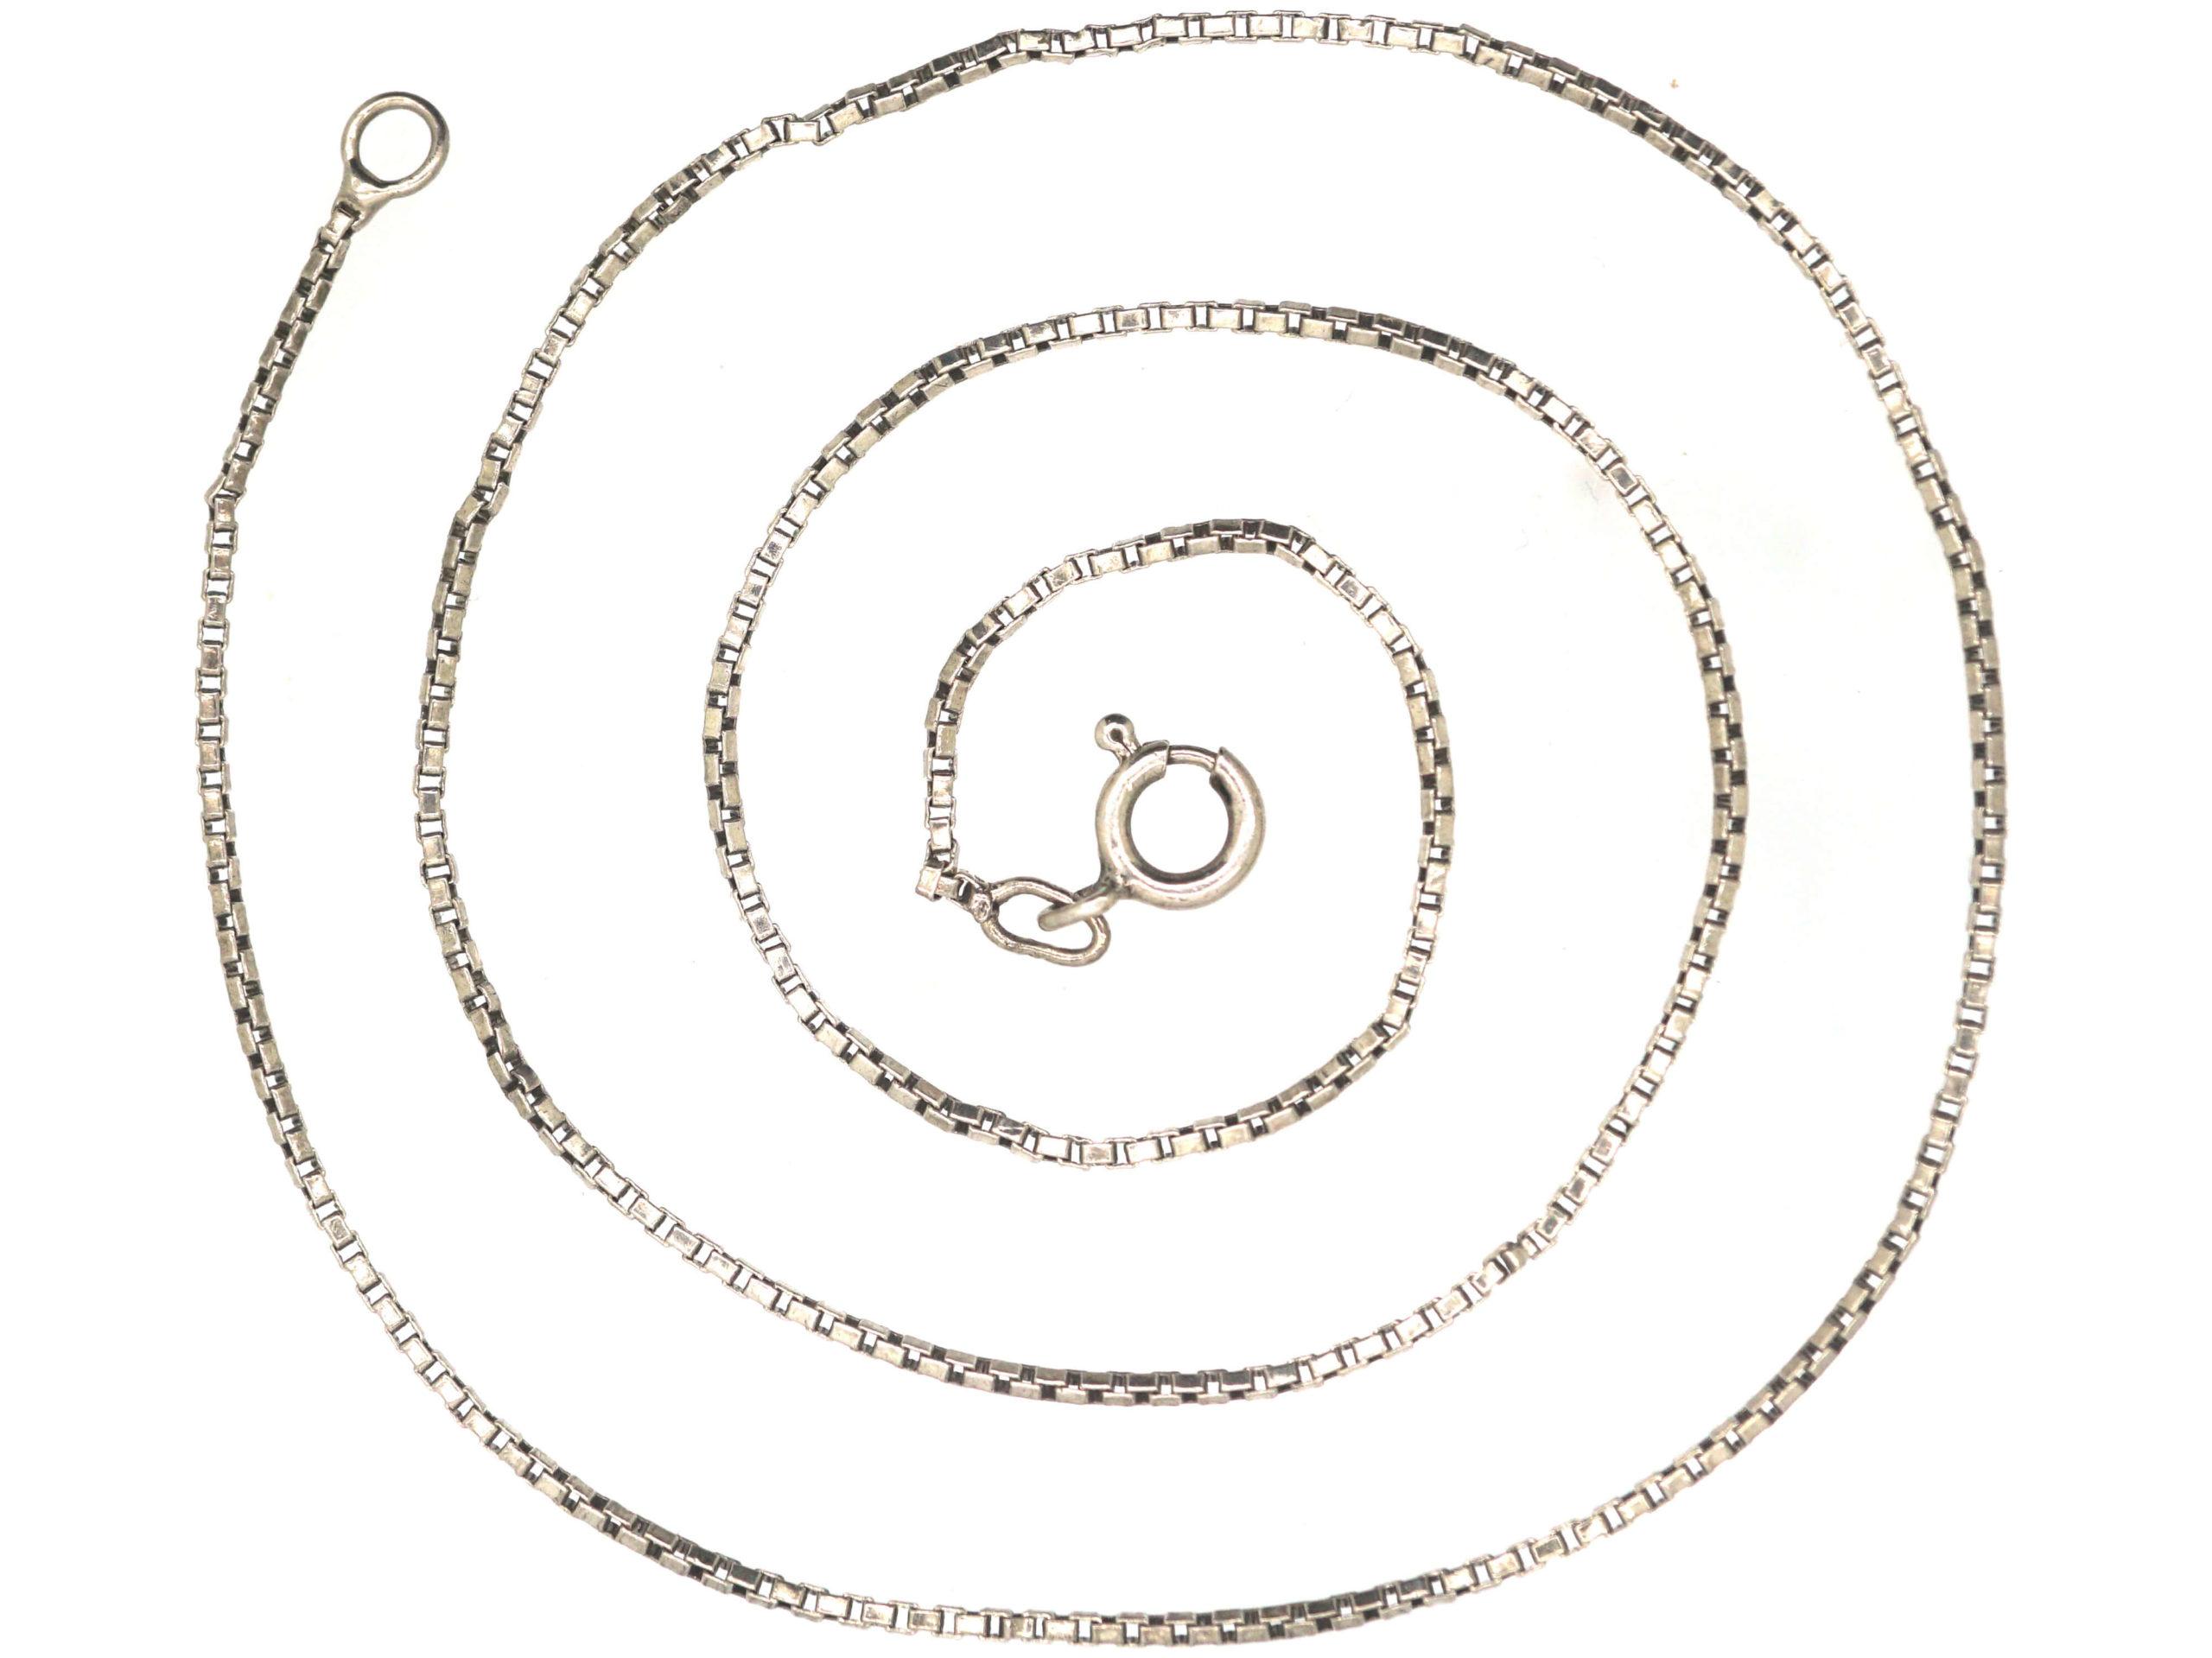 14ct White Gold Narrow Box Link Chain